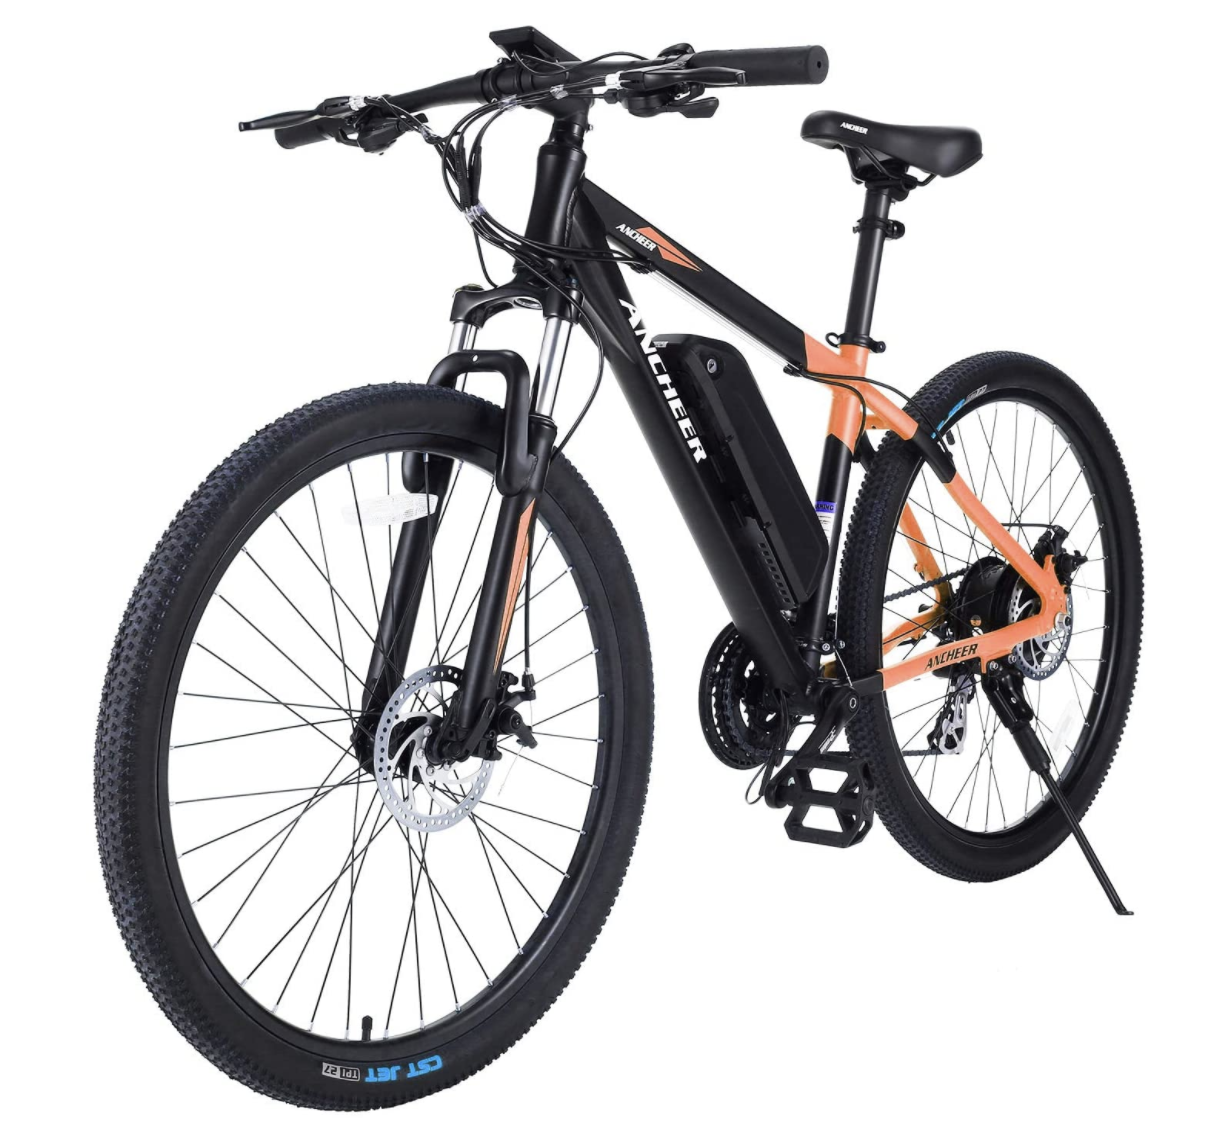 ANCHEER 20 Electric Bike